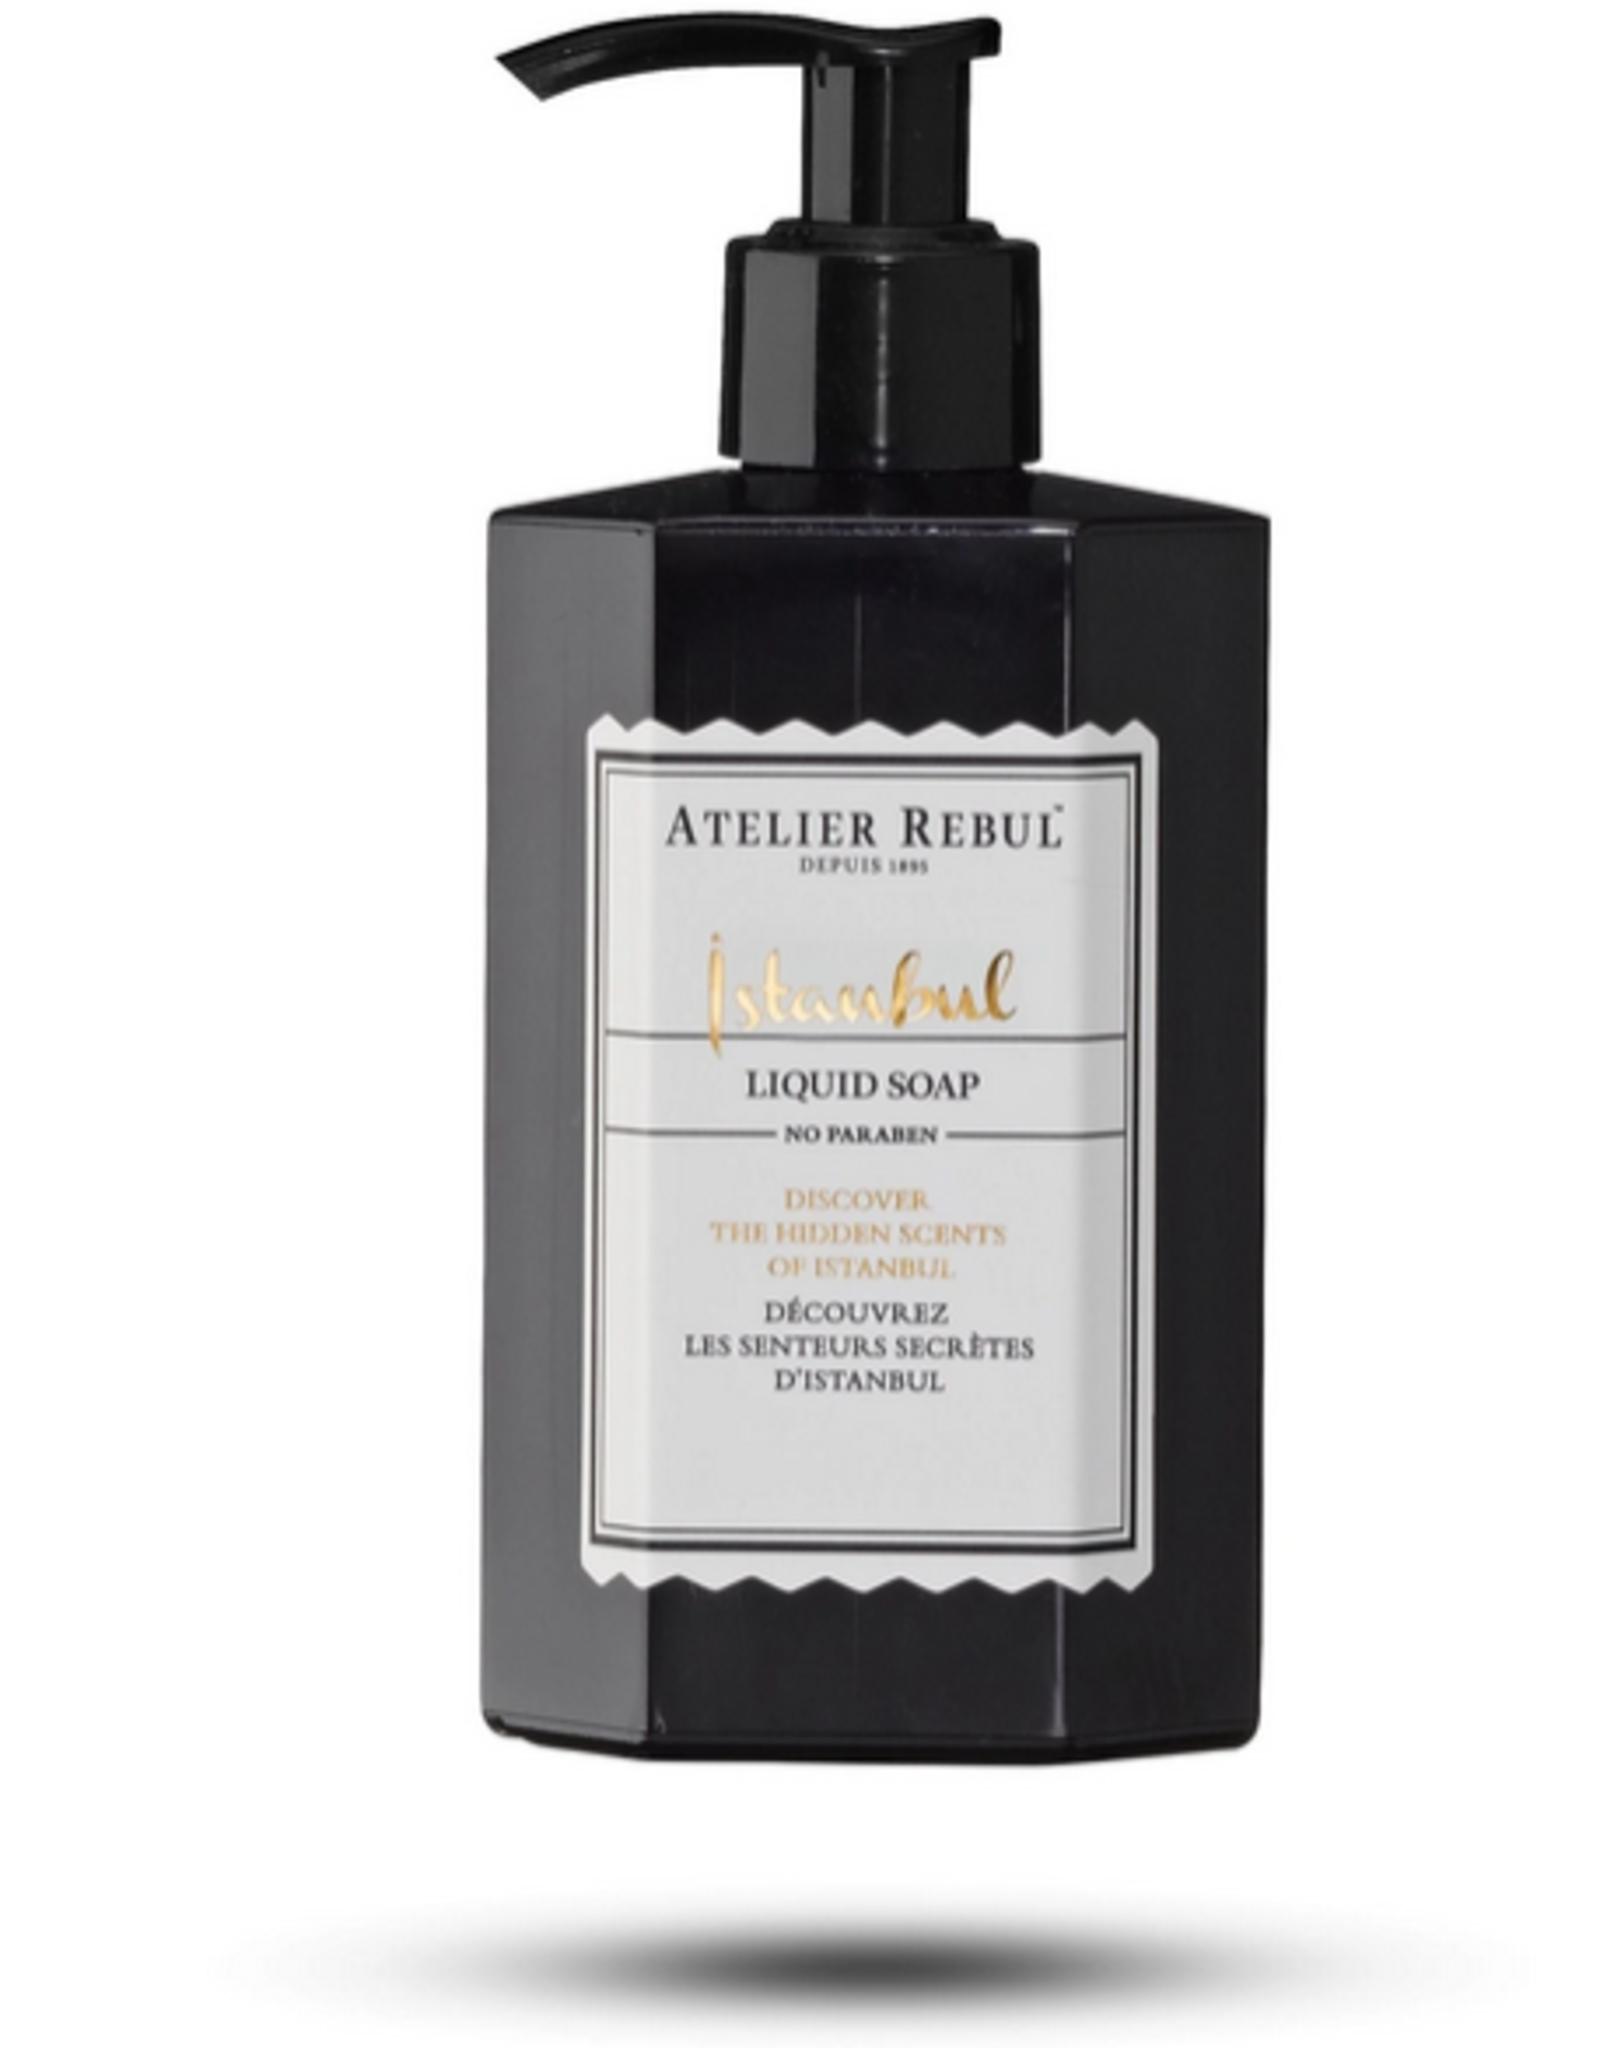 Atelier Rebul Atelier Rebul - Istanbul Liquid soap - 430 ml